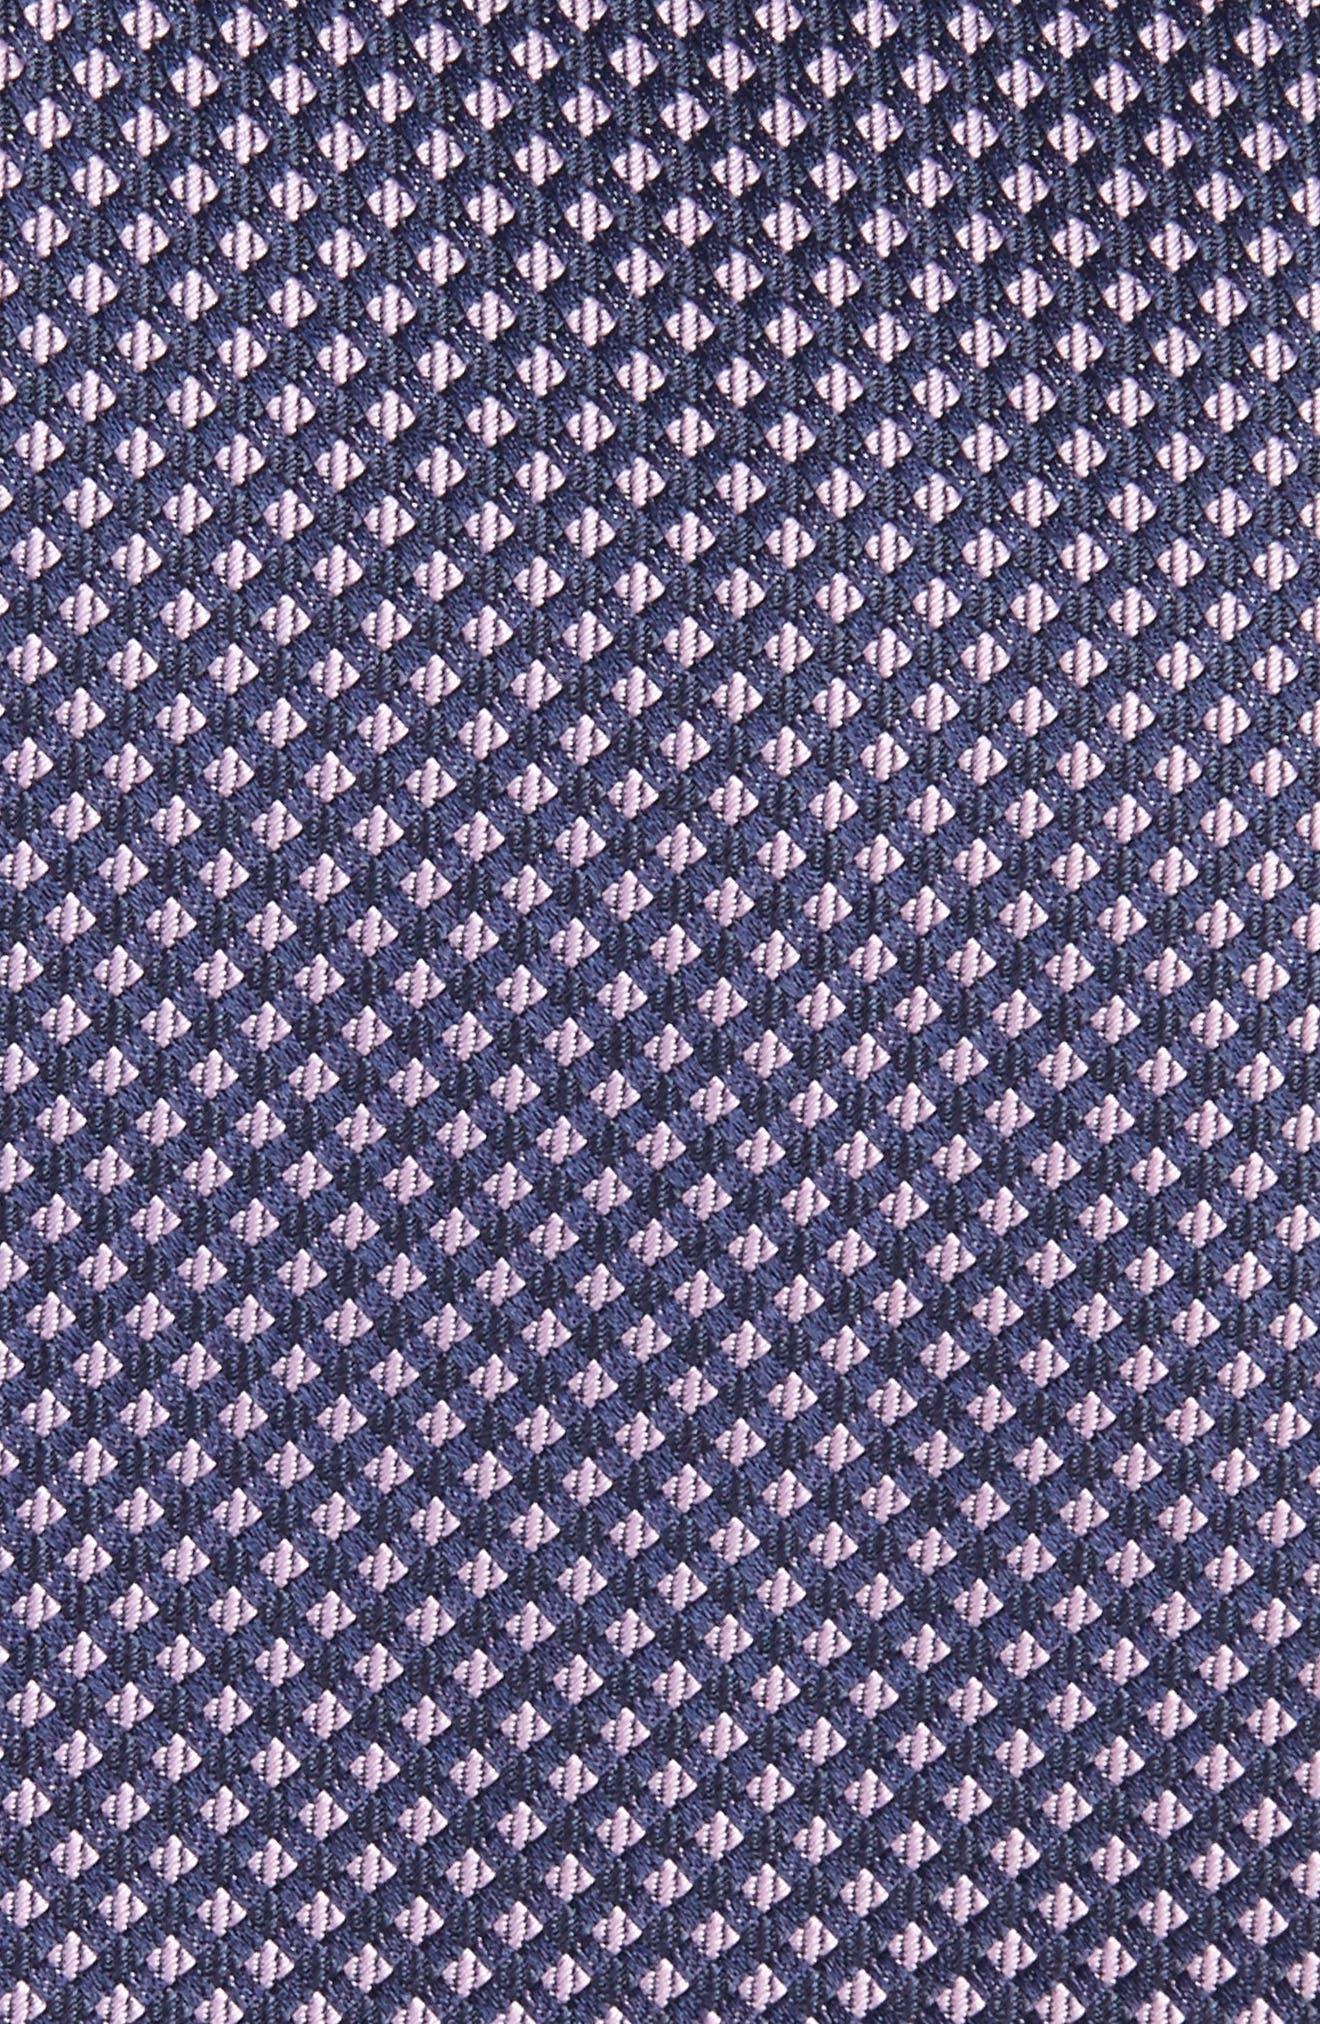 Geometric Silk Tie,                             Alternate thumbnail 2, color,                             534